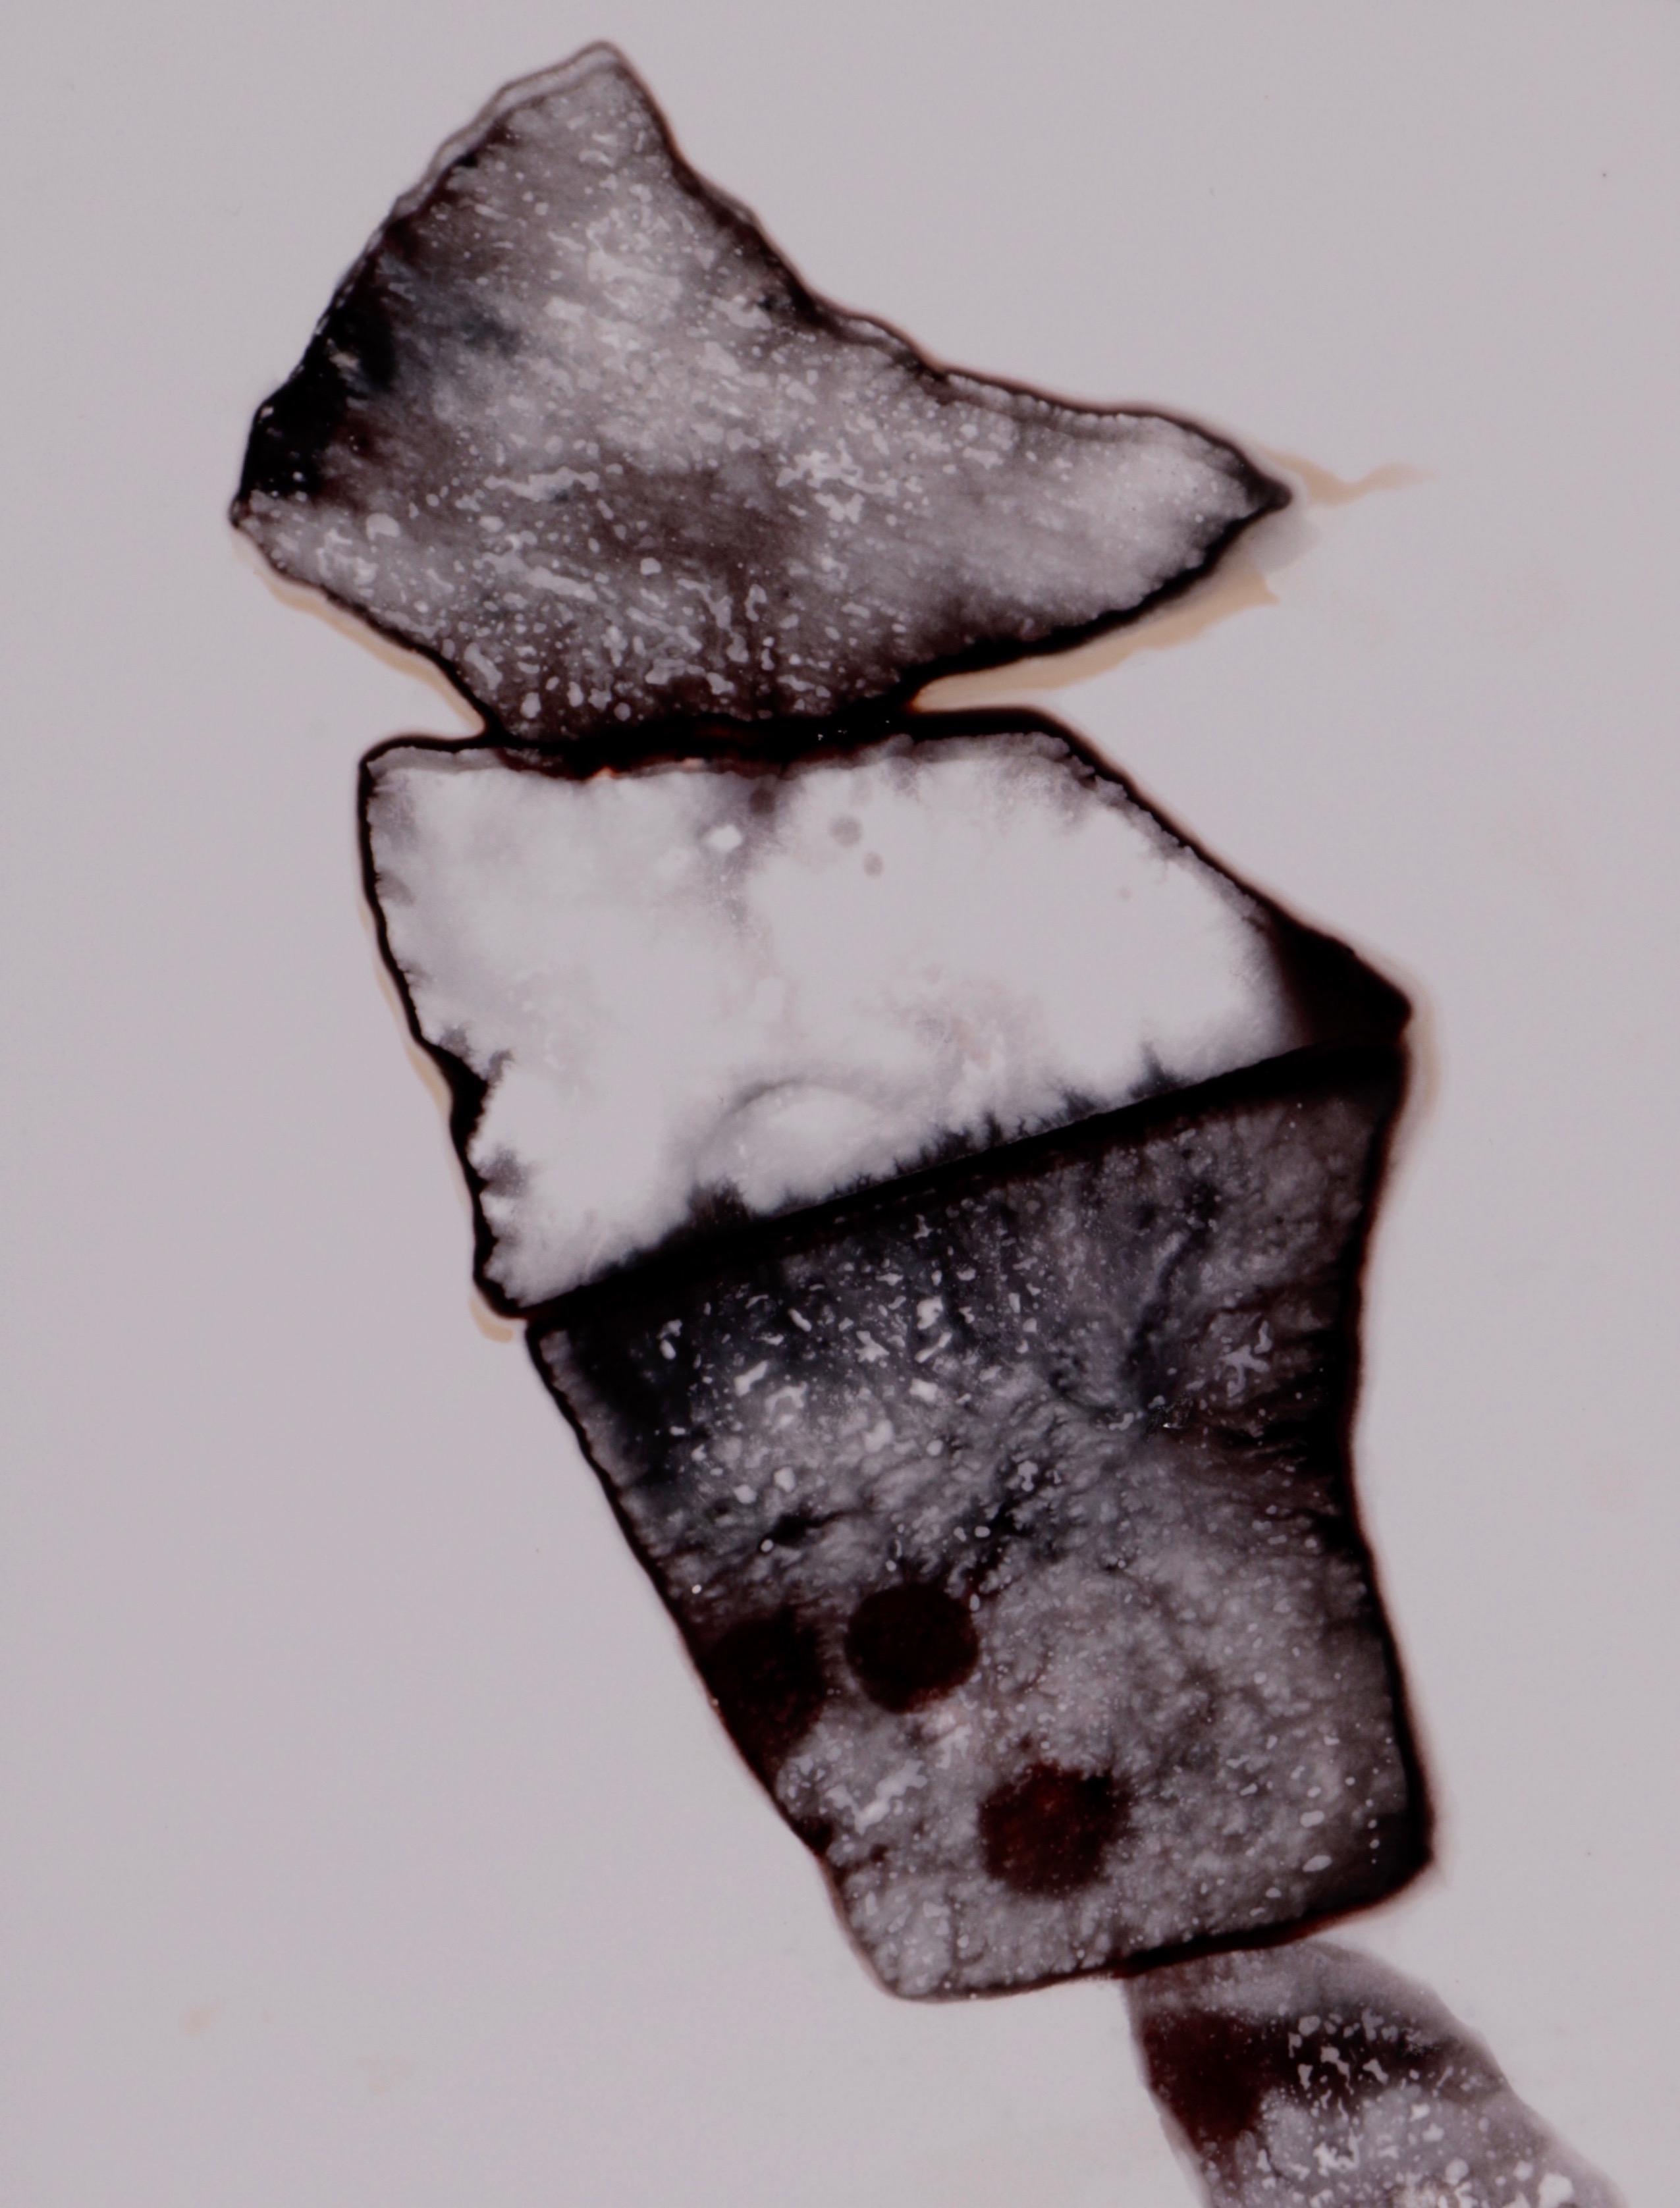 Earth no. 36 (2002) - Ilan Wolff